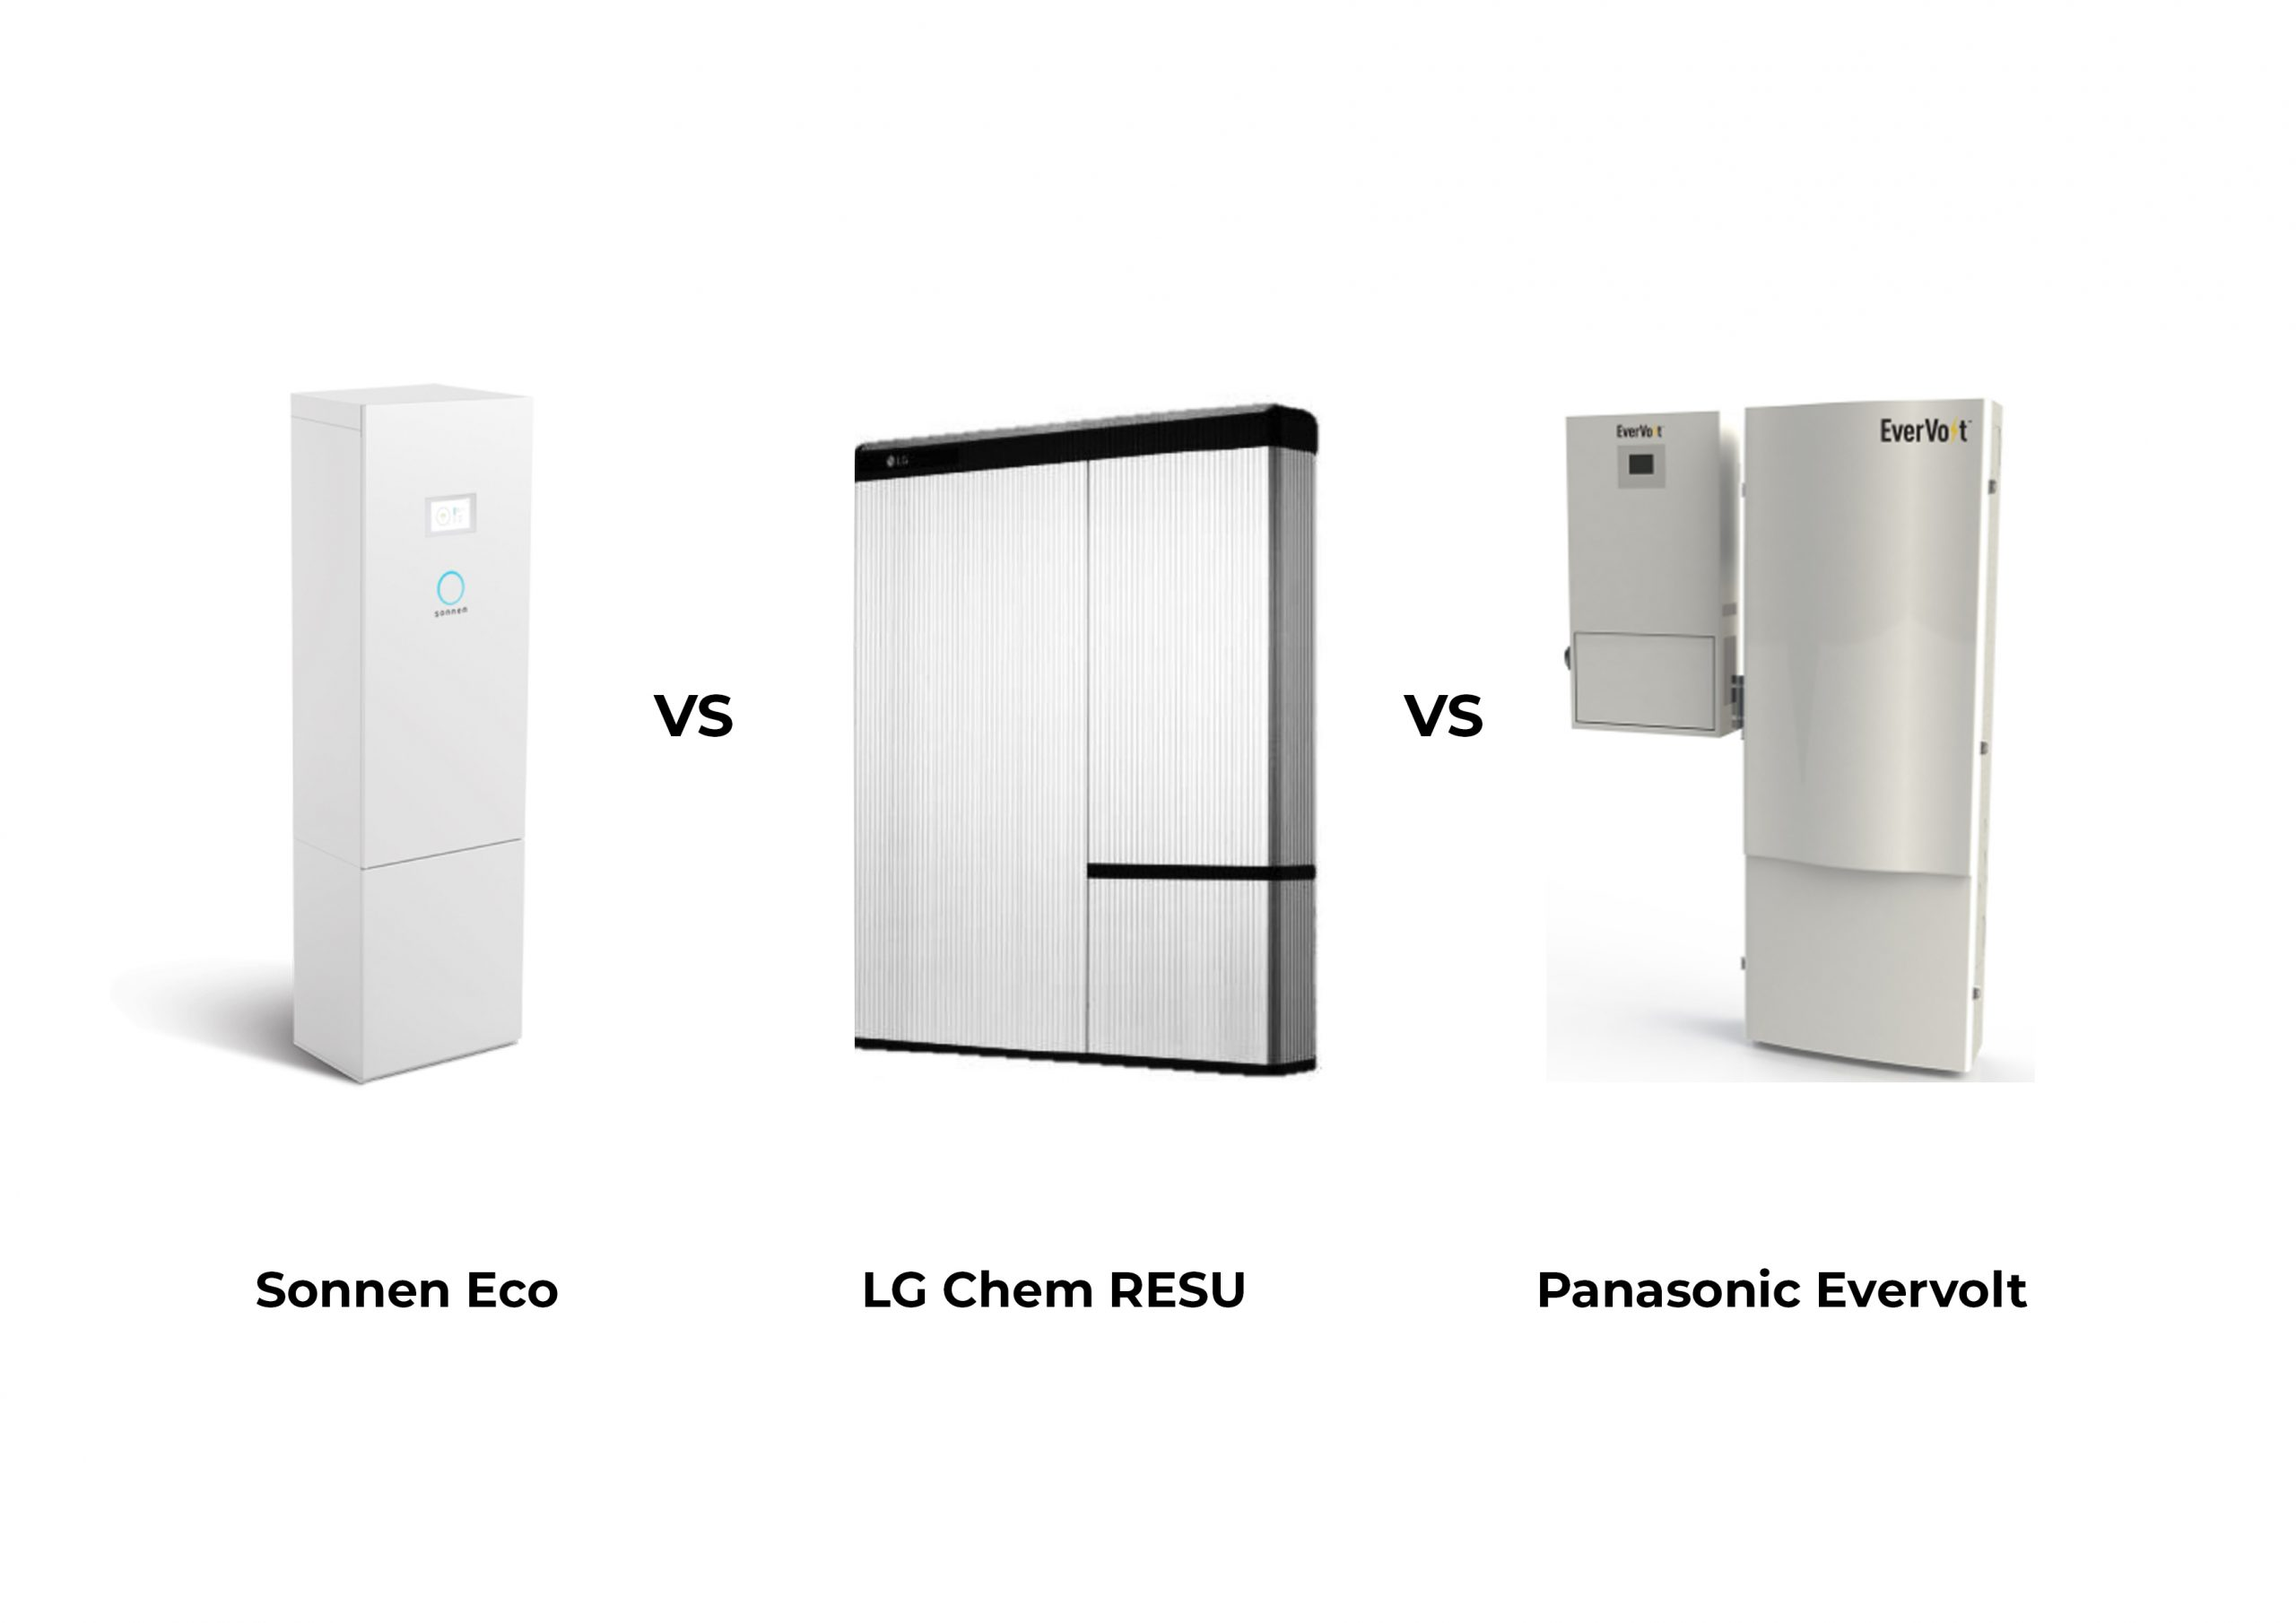 Sonnen Vs LG Chem Vs Panasonic Evervolt